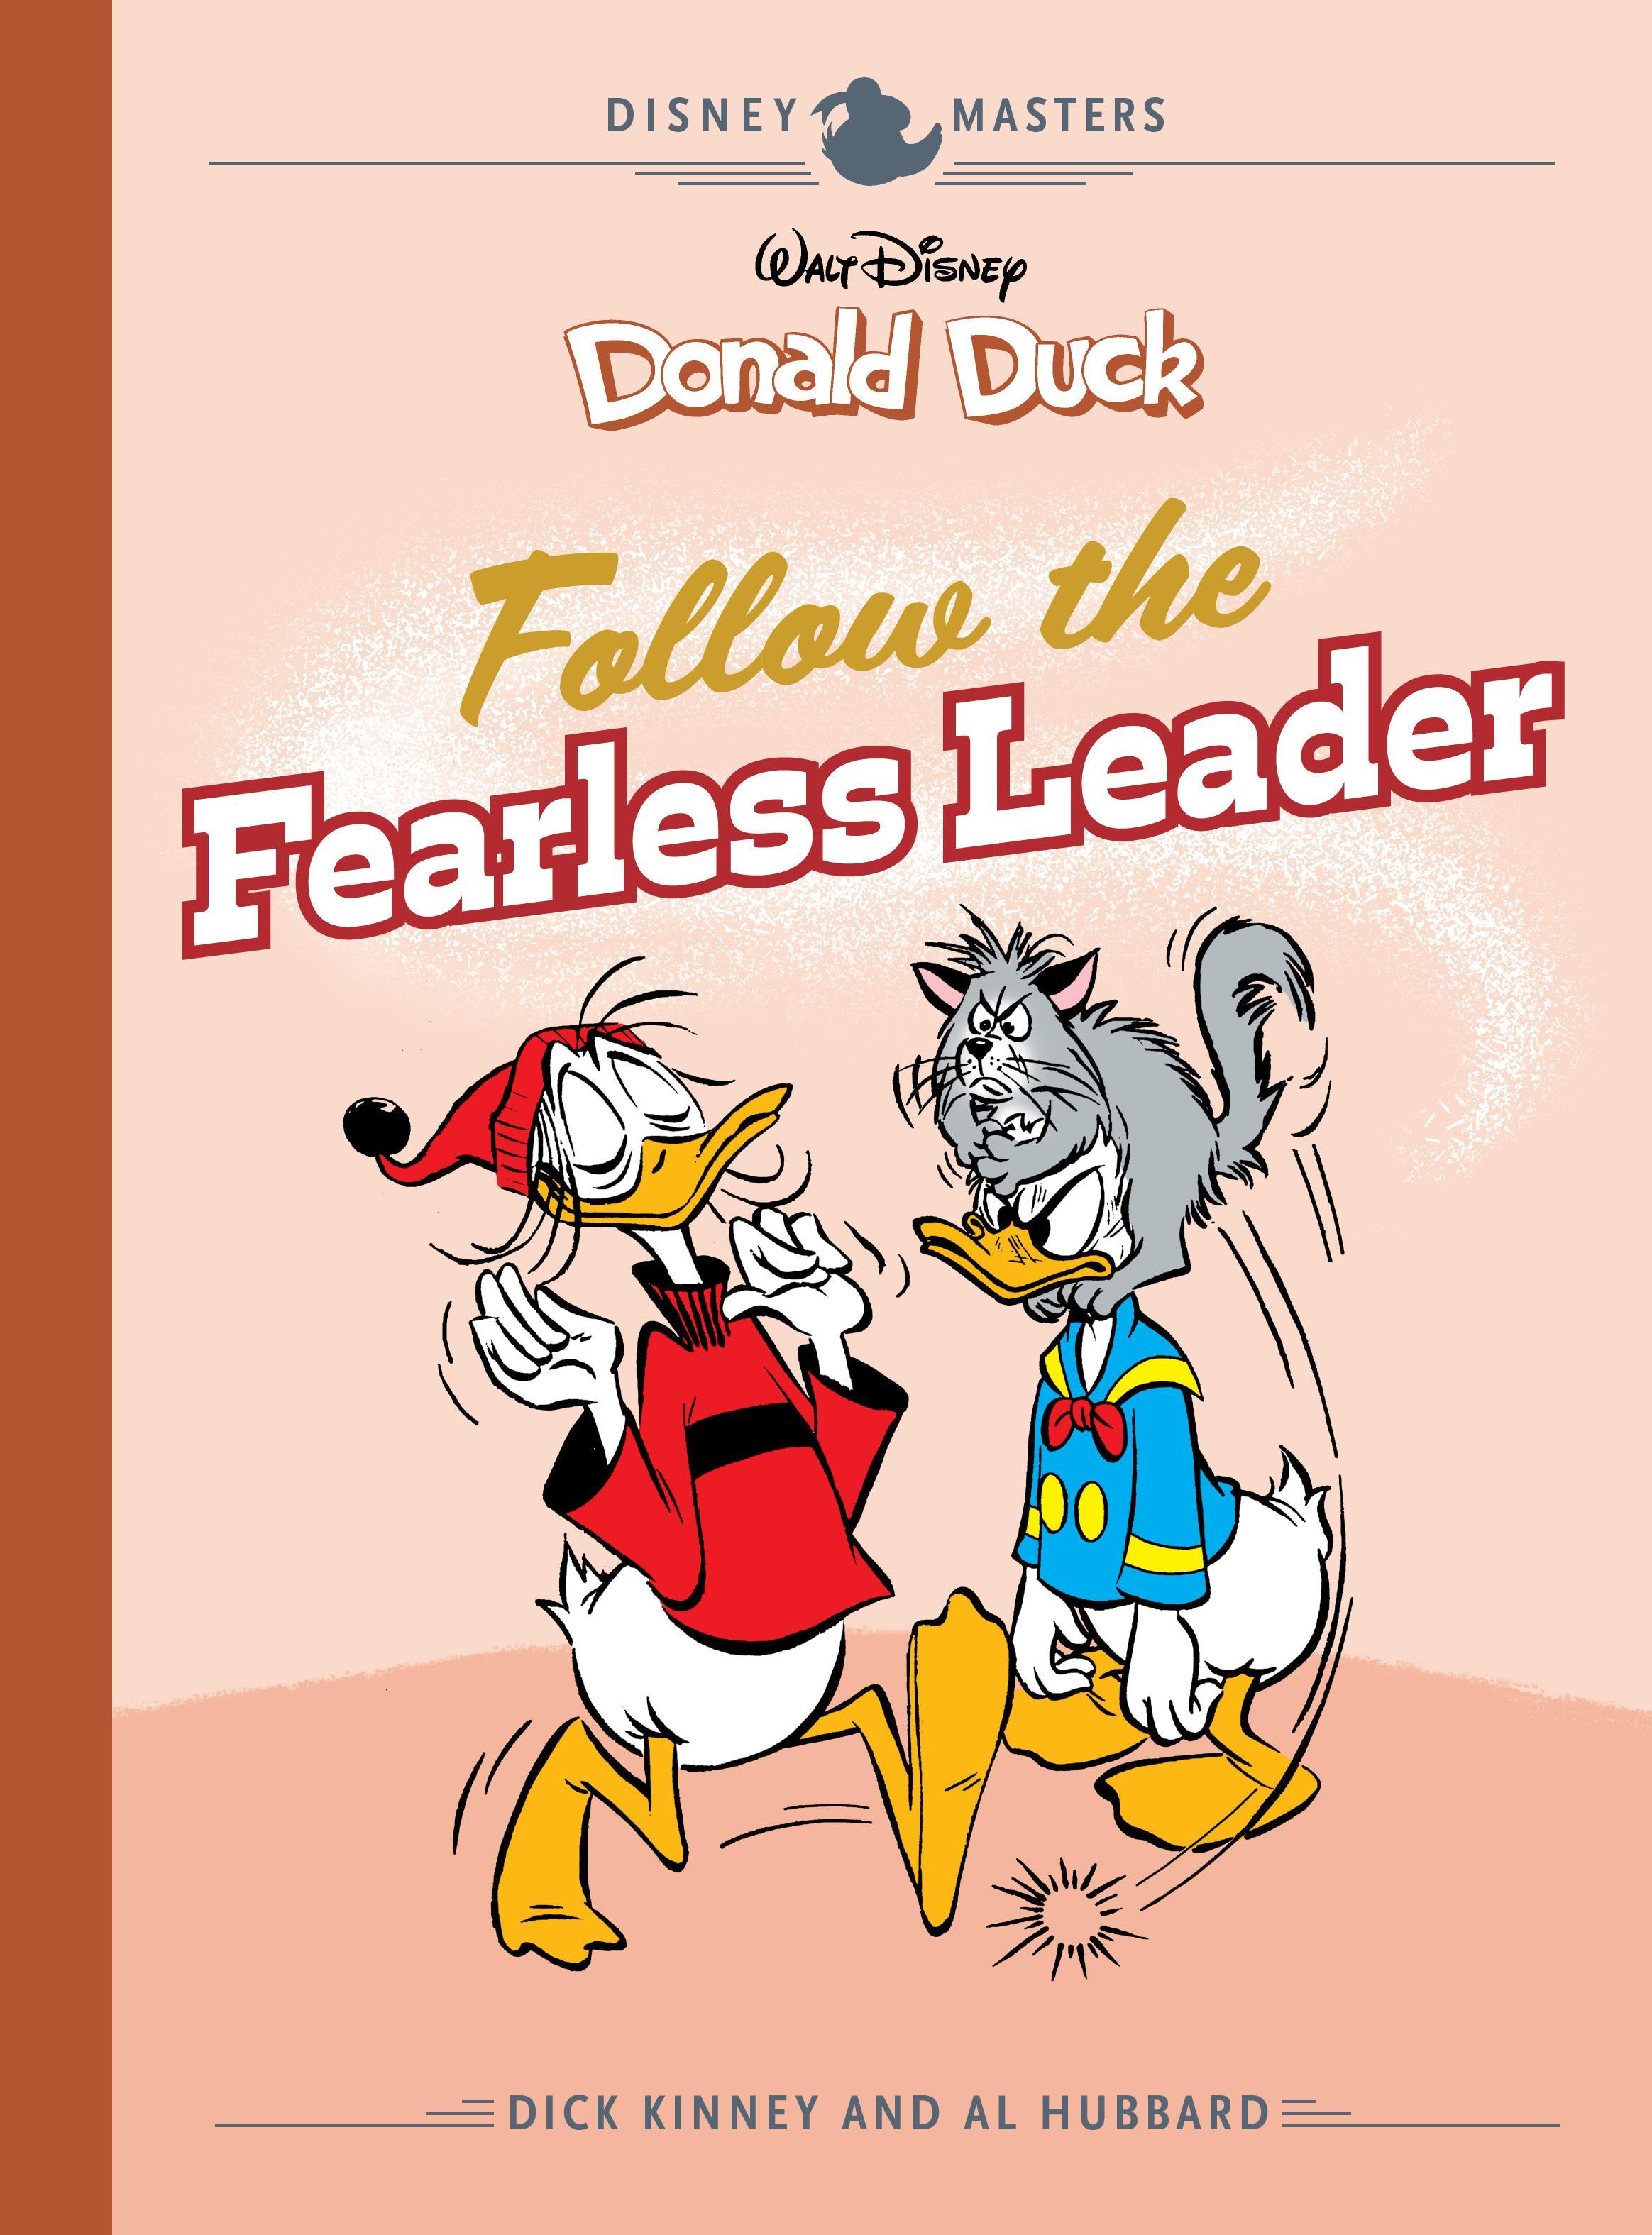 Disney Masters v14-Donald Duck-Follow the Fearless Leader 2020 digital Salem